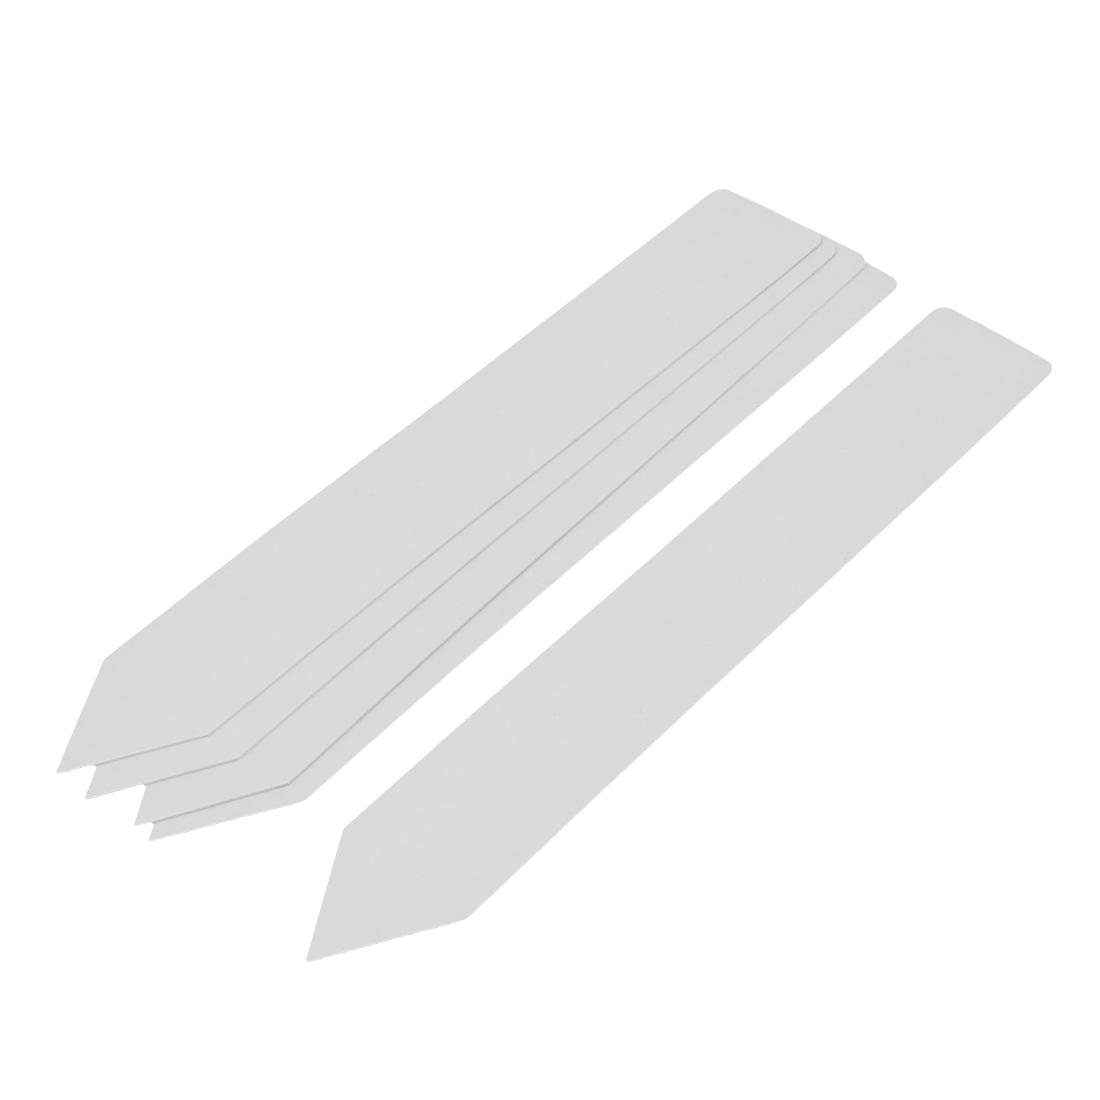 20cmx3cm Plastic Nursery Garden Plant Seeding Tag Label Marker Stick White 5Pcs